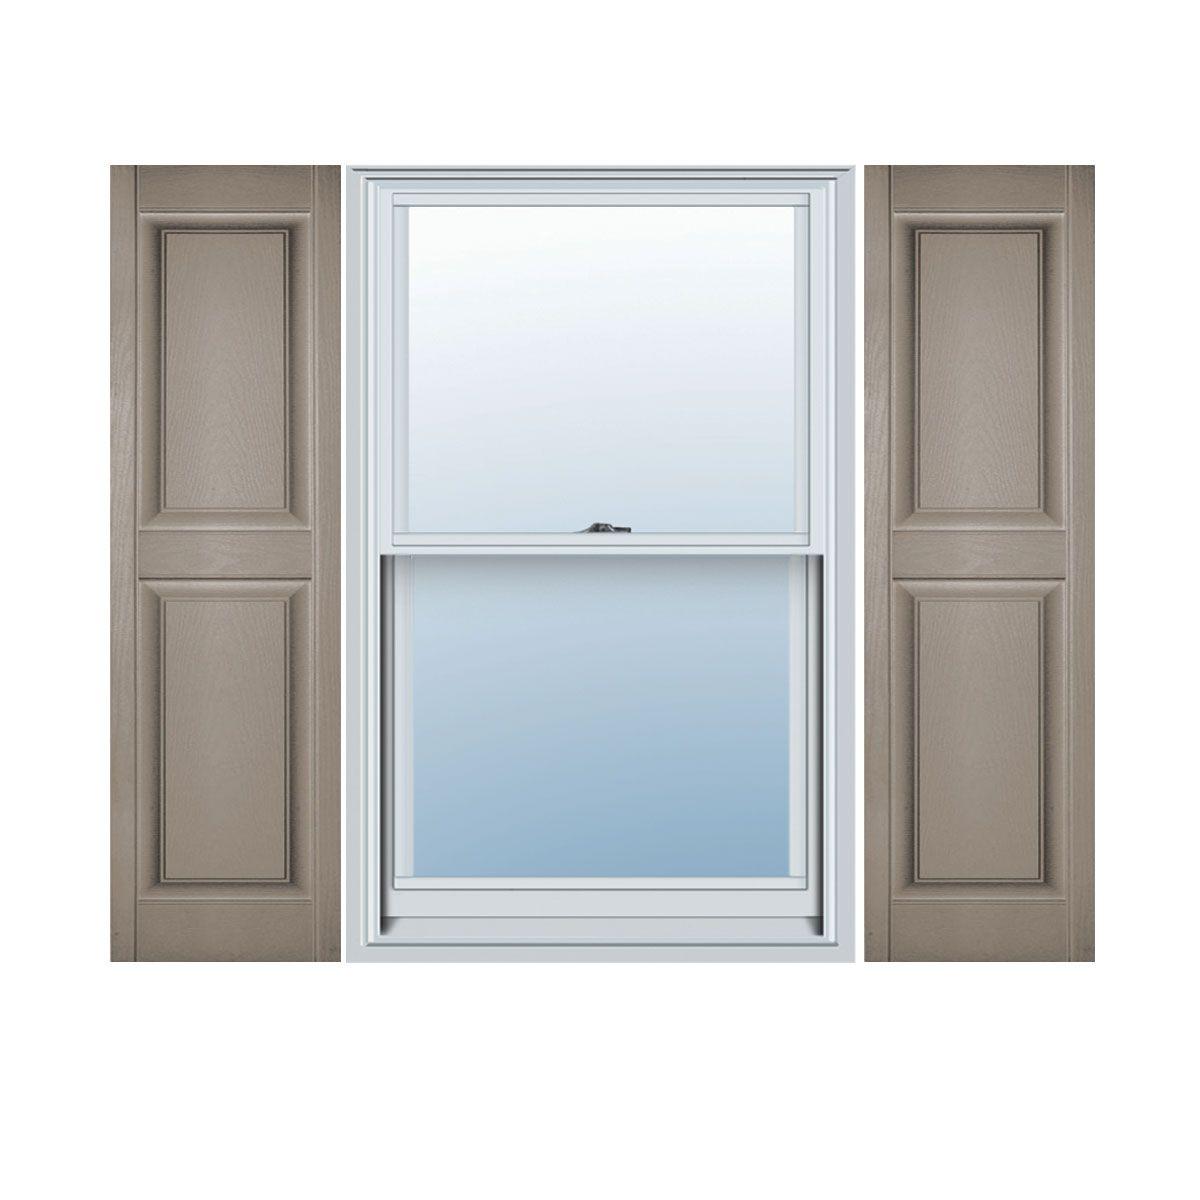 Traditional Premium Vinyl Raised Panel Custom Window Shutters W Installation Shutter Lok S Per Pair Raised Panel Shutters Builders Edge Louvered Shutters